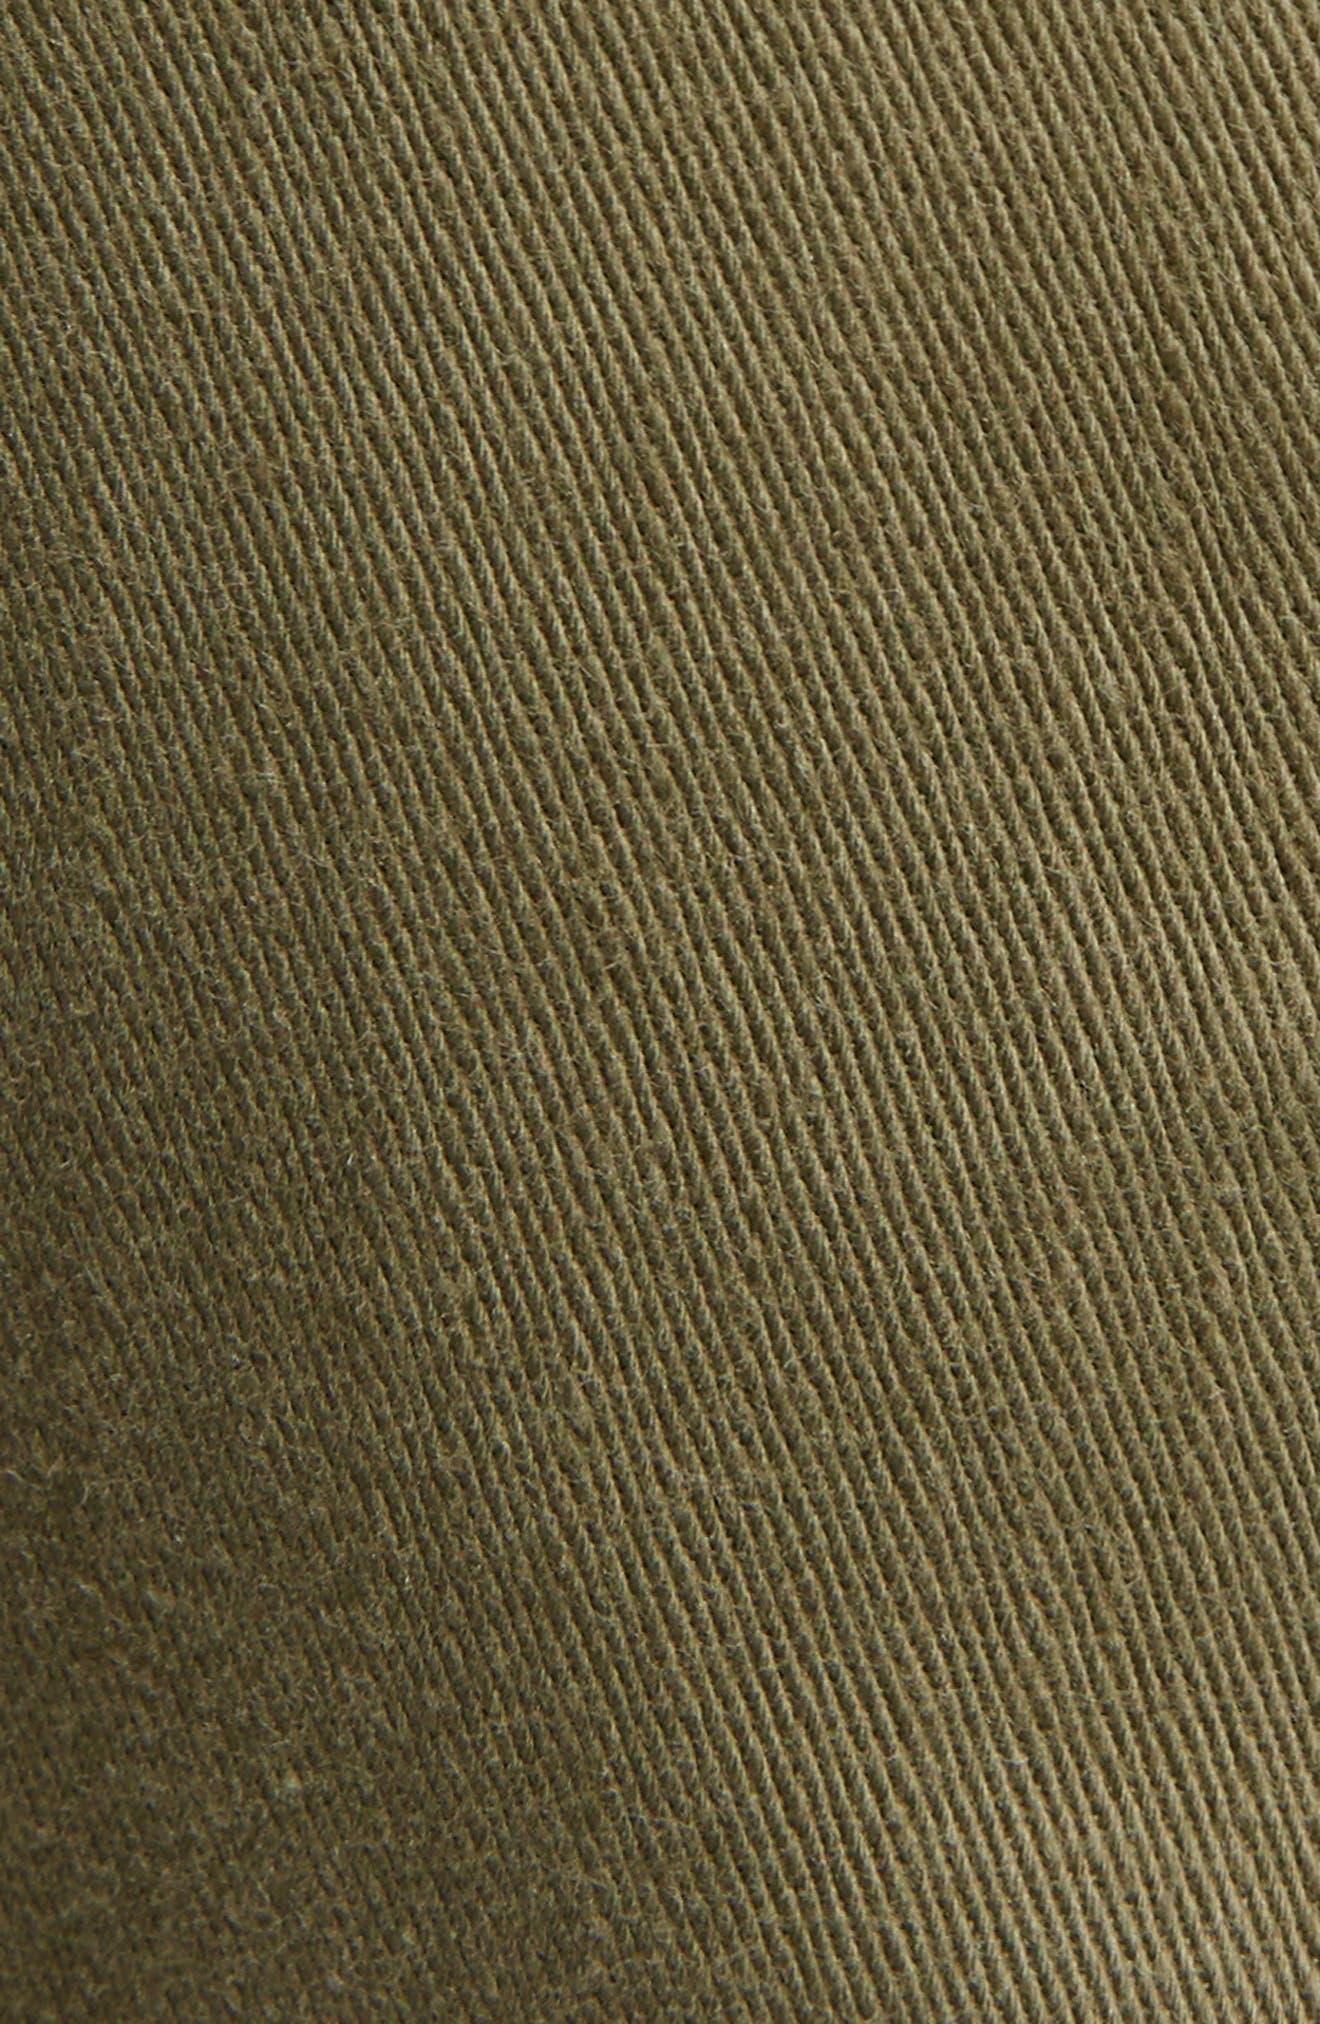 Laced Cotton & Linen Shorts,                             Alternate thumbnail 7, color,                             Kaki